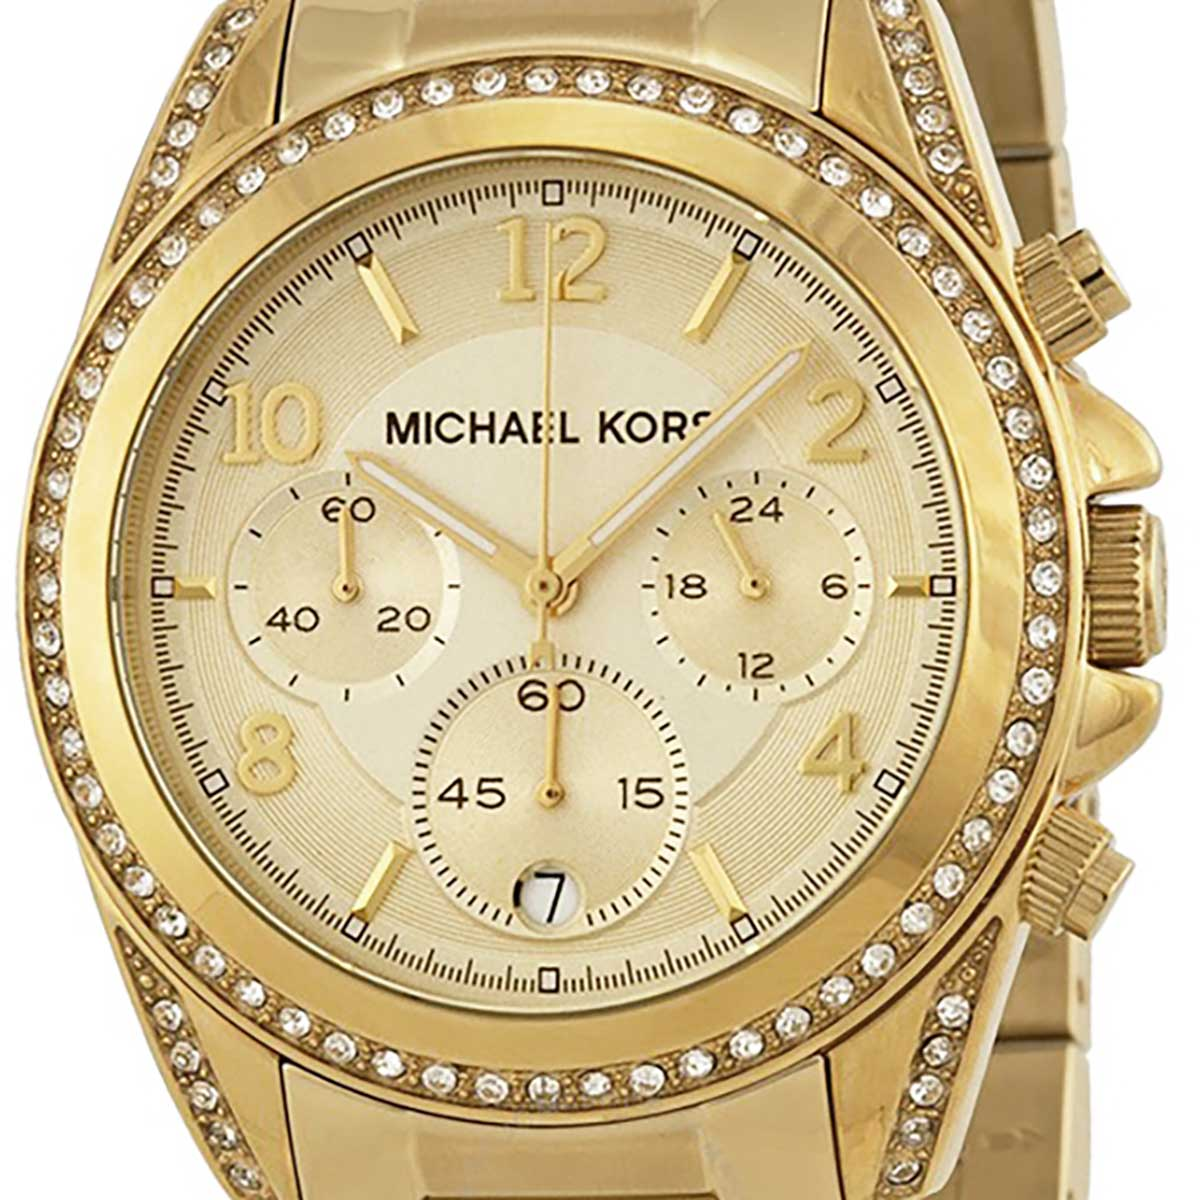 Michael Kors マイケル・コース 電池式クォーツ 腕時計 [MK5166] 並行輸入品  デイト クロノグラフ